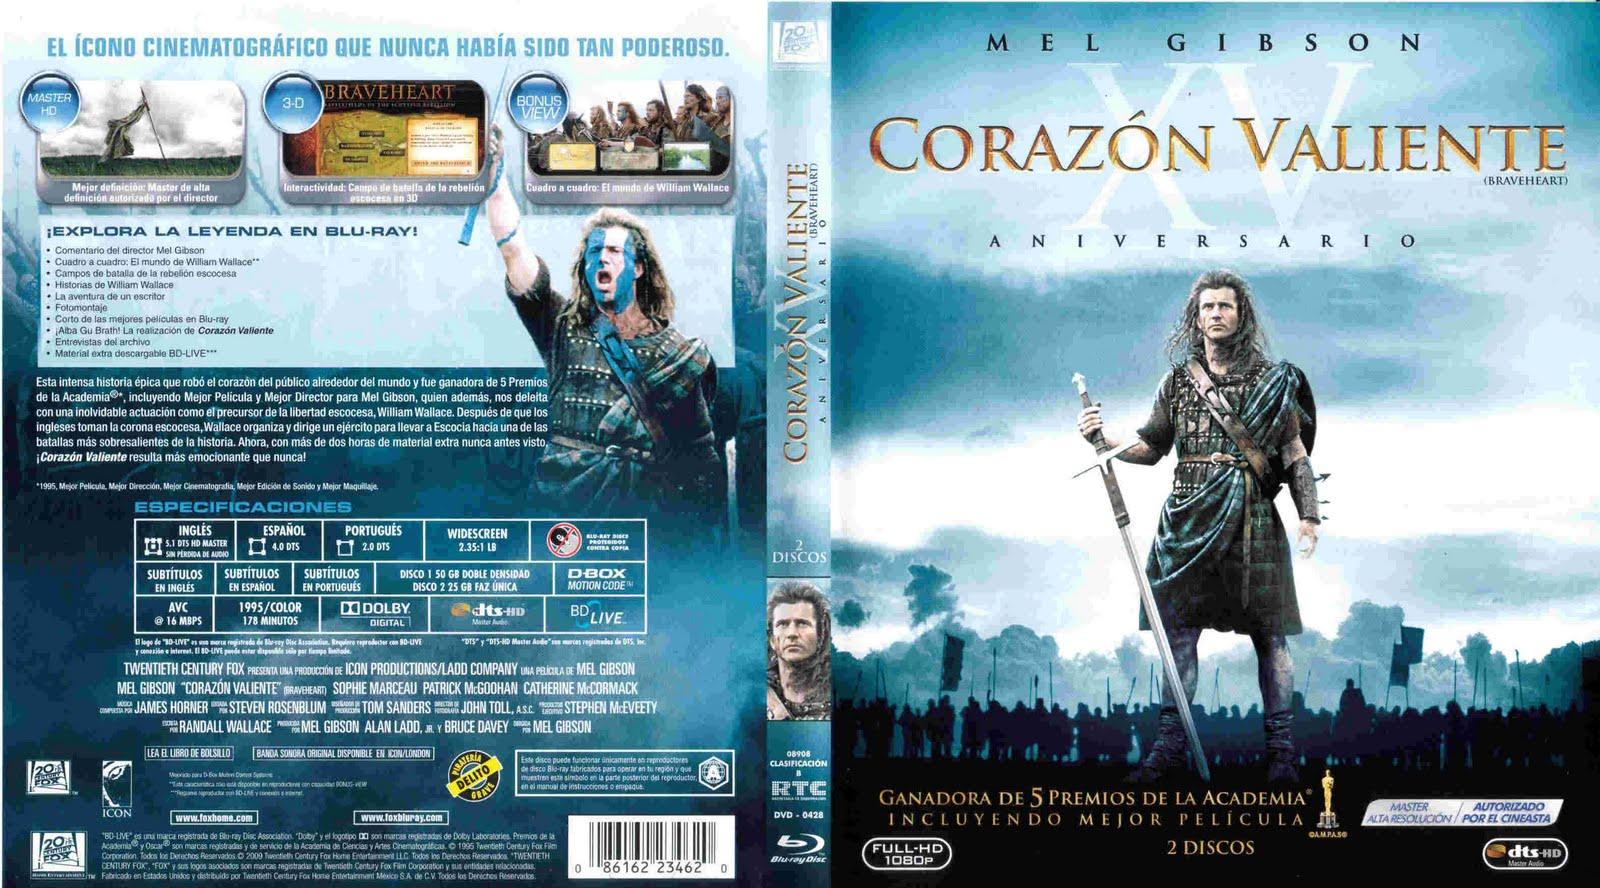 Corazon valiente 1995 1080p mkv dual identi Corazon valiente pelicula